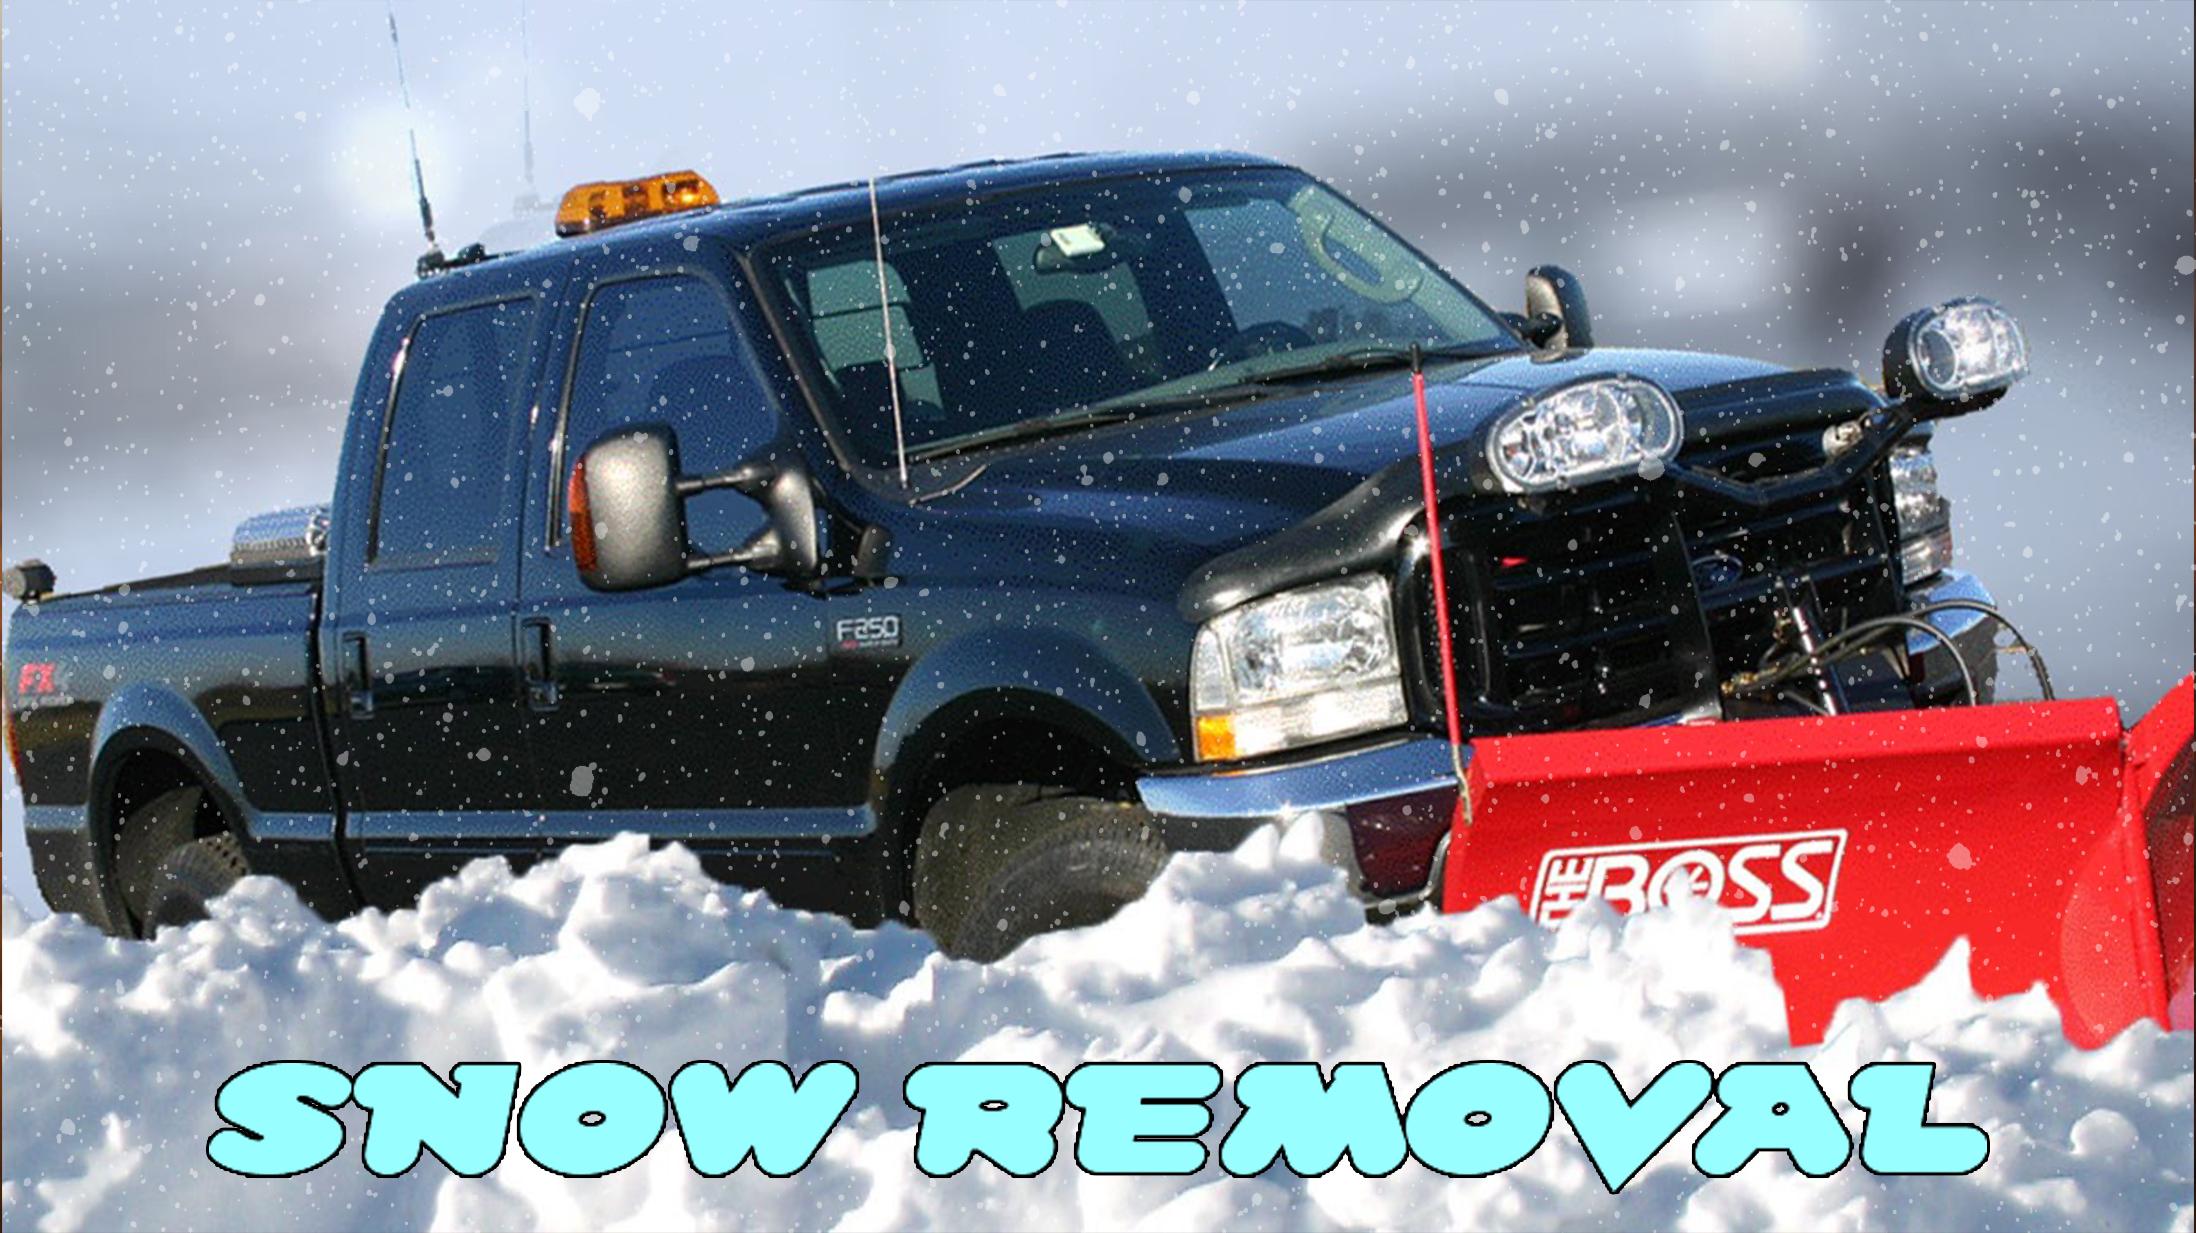 Snow Removal 1 20 2016_1453333277603.jpg